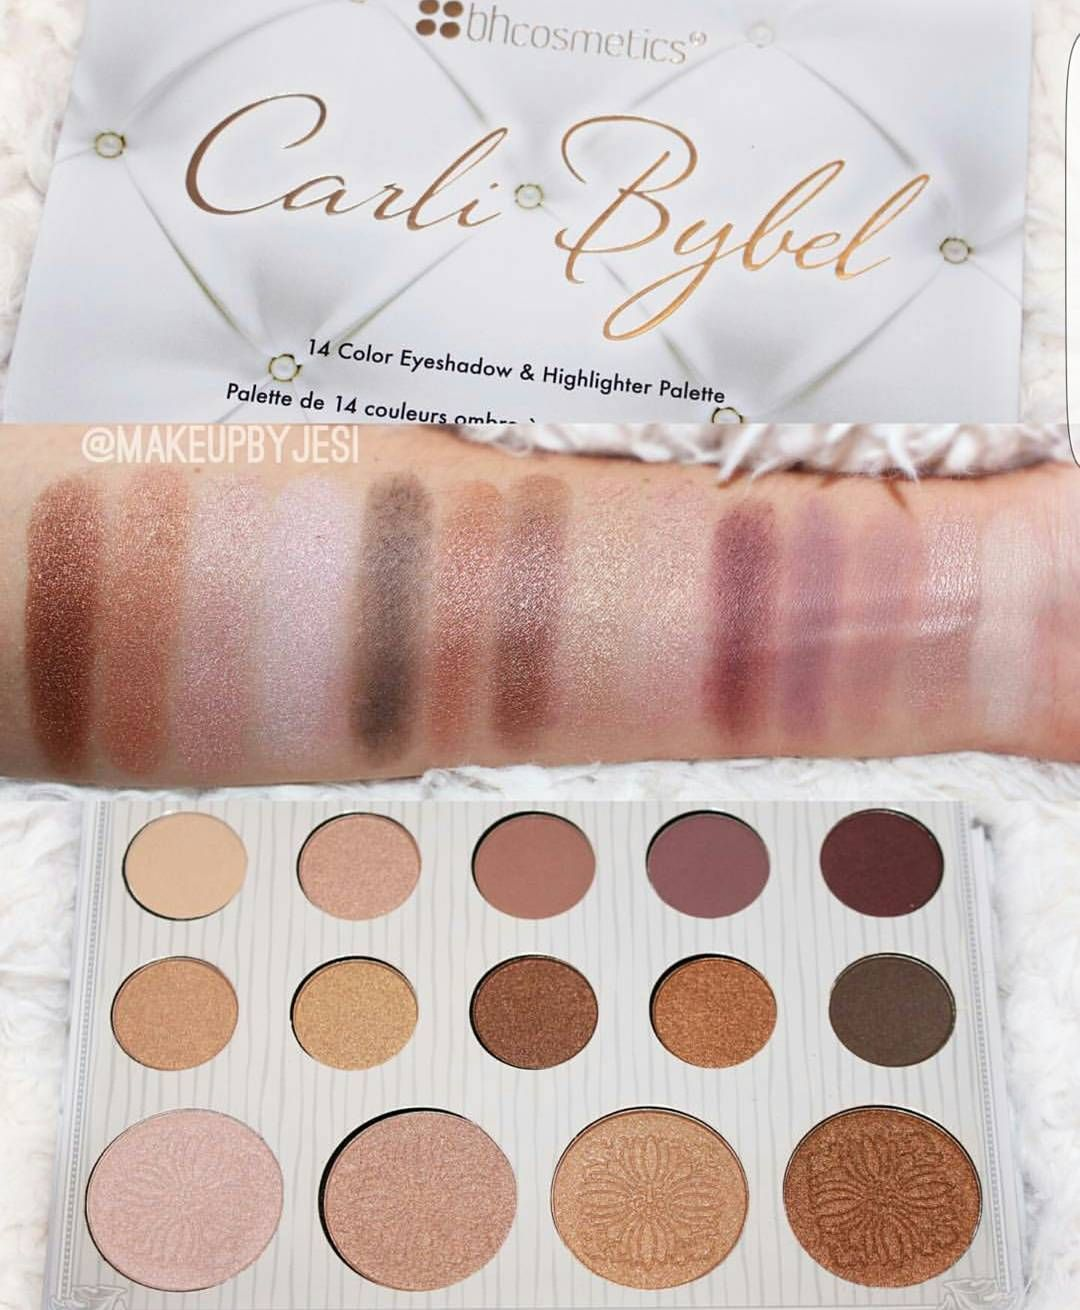 Instagram Carli Bybel Palette Bh Cosmetics Instagram Posts